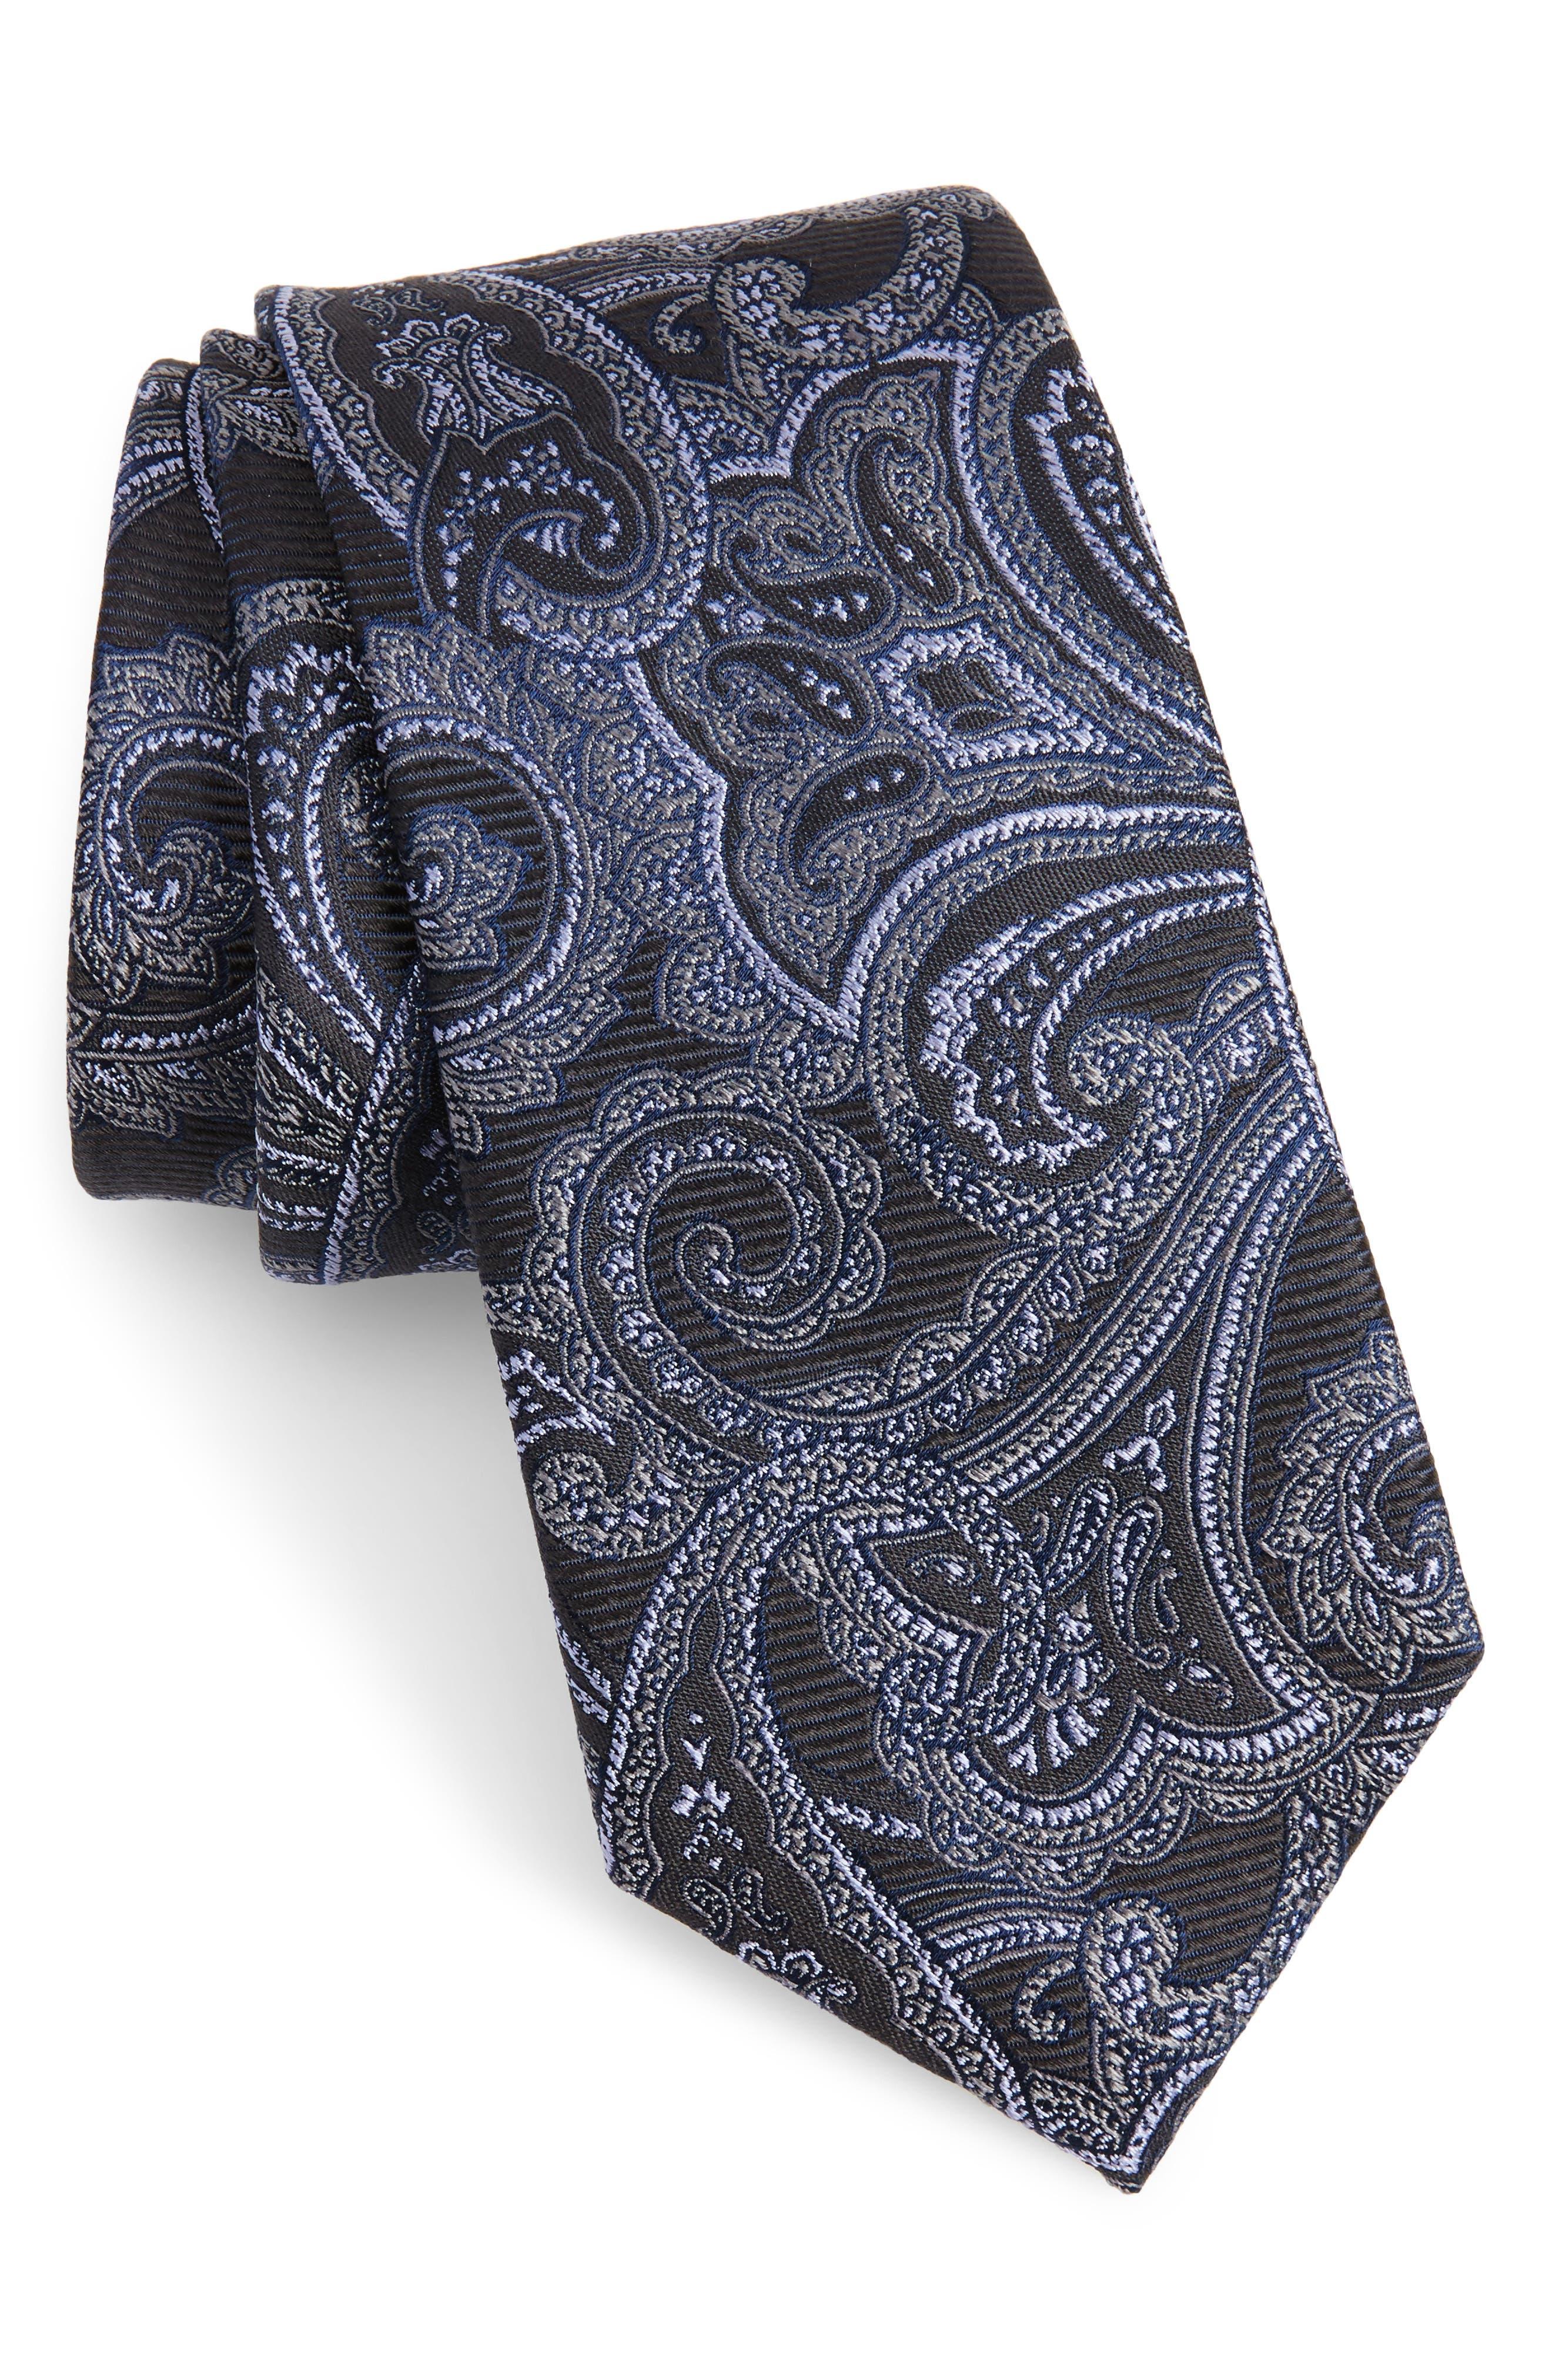 Avalon Paisley Silk Tie,                             Main thumbnail 1, color,                             001